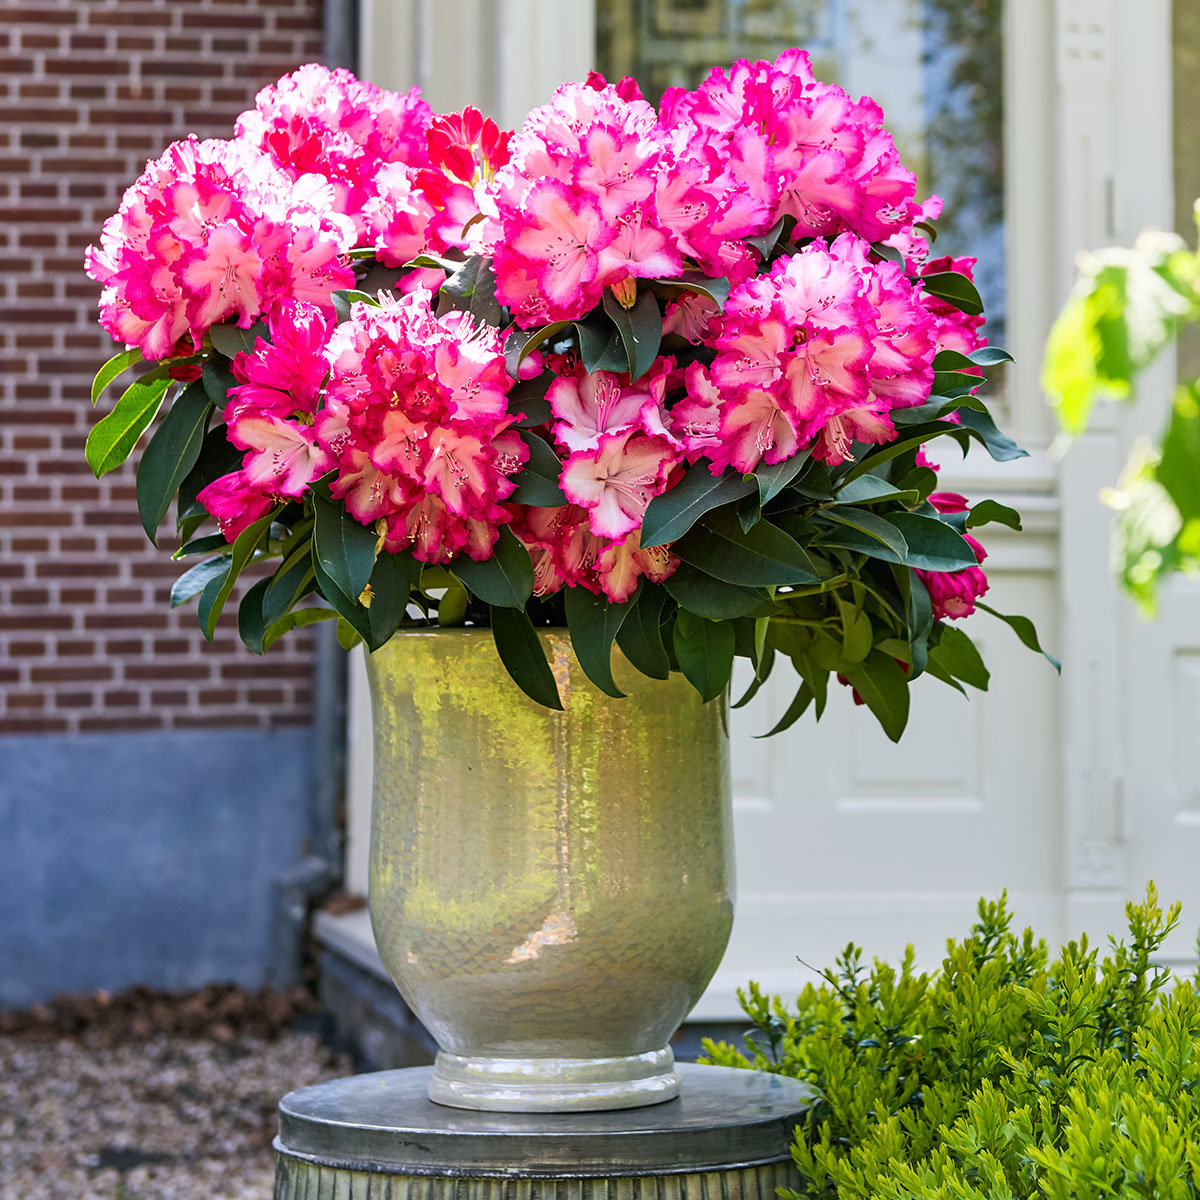 Rhododendron, rosa-weiß, im ca. 19 cm-Topf | #2